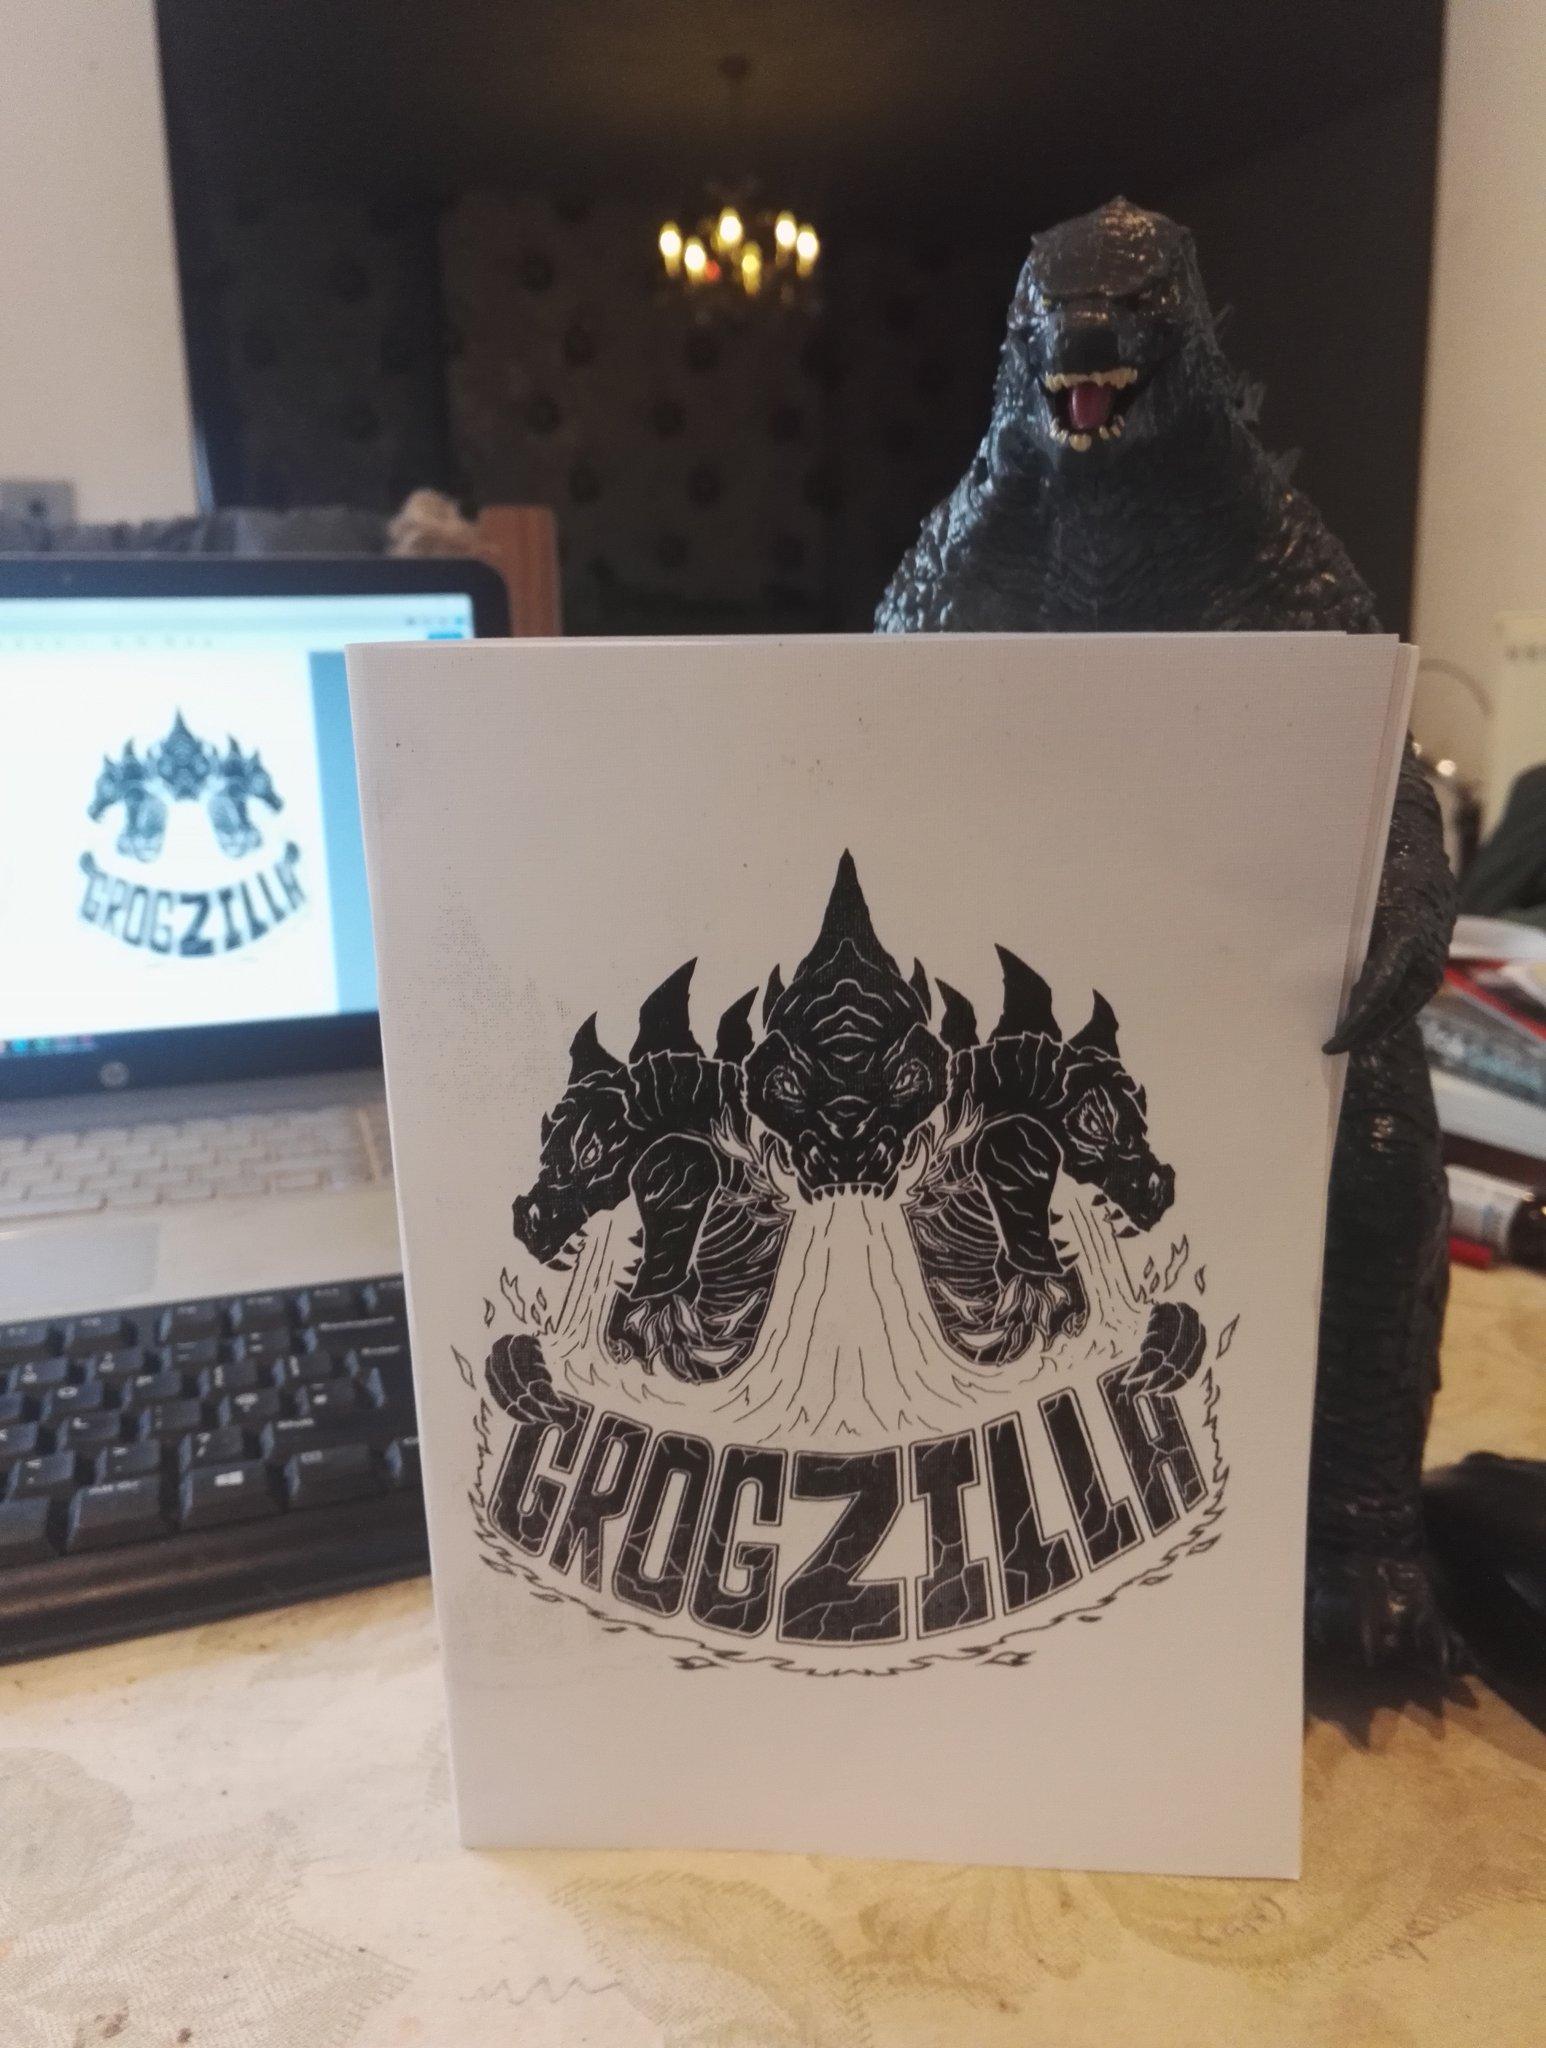 Grogzilla - Preorder